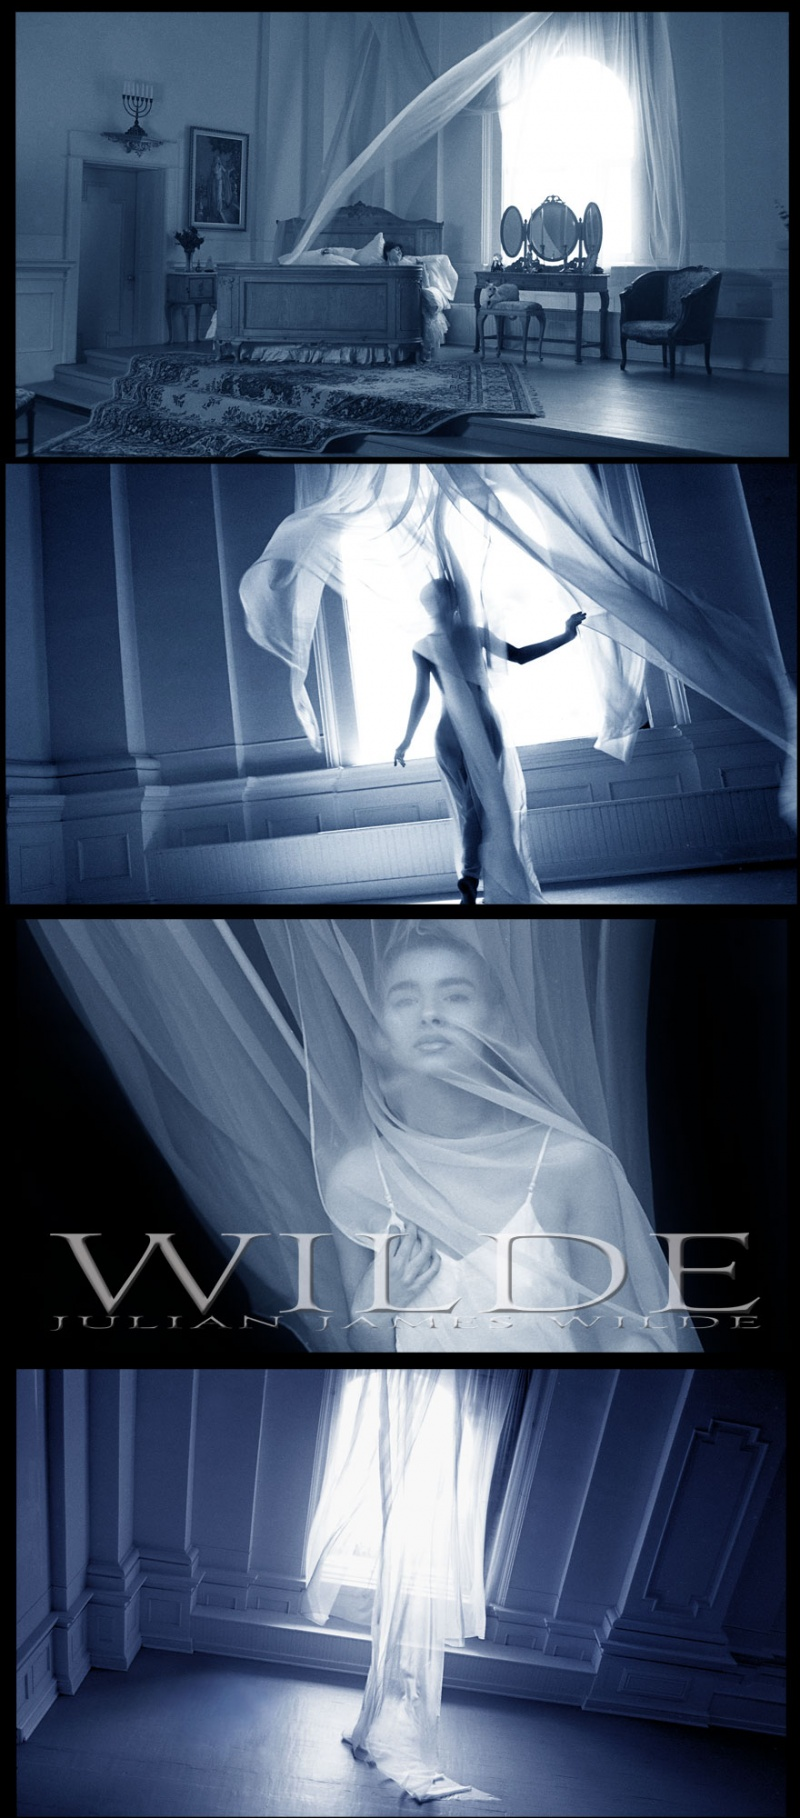 Wilde Studio, The Grand Salon Oct 18, 2008 julian james wilde @2008 Adriannas Dream   (for